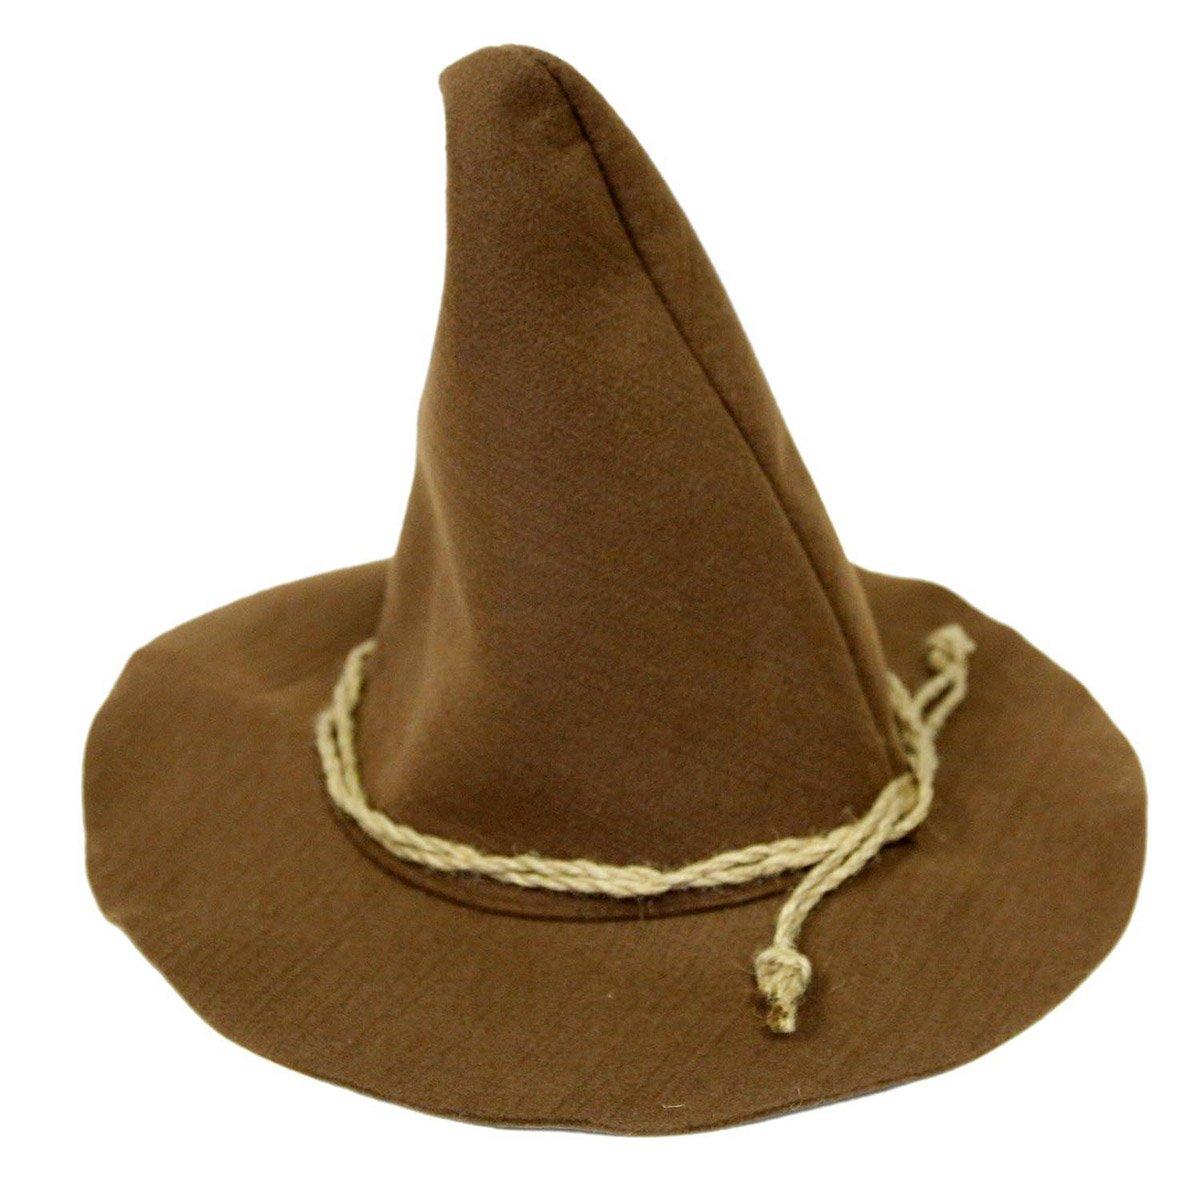 Adult Scarecrow Hat Deluxe Felt Oktoberfest Wizard oz Hillbilly Hat Costume Jacobson 27770BKAO